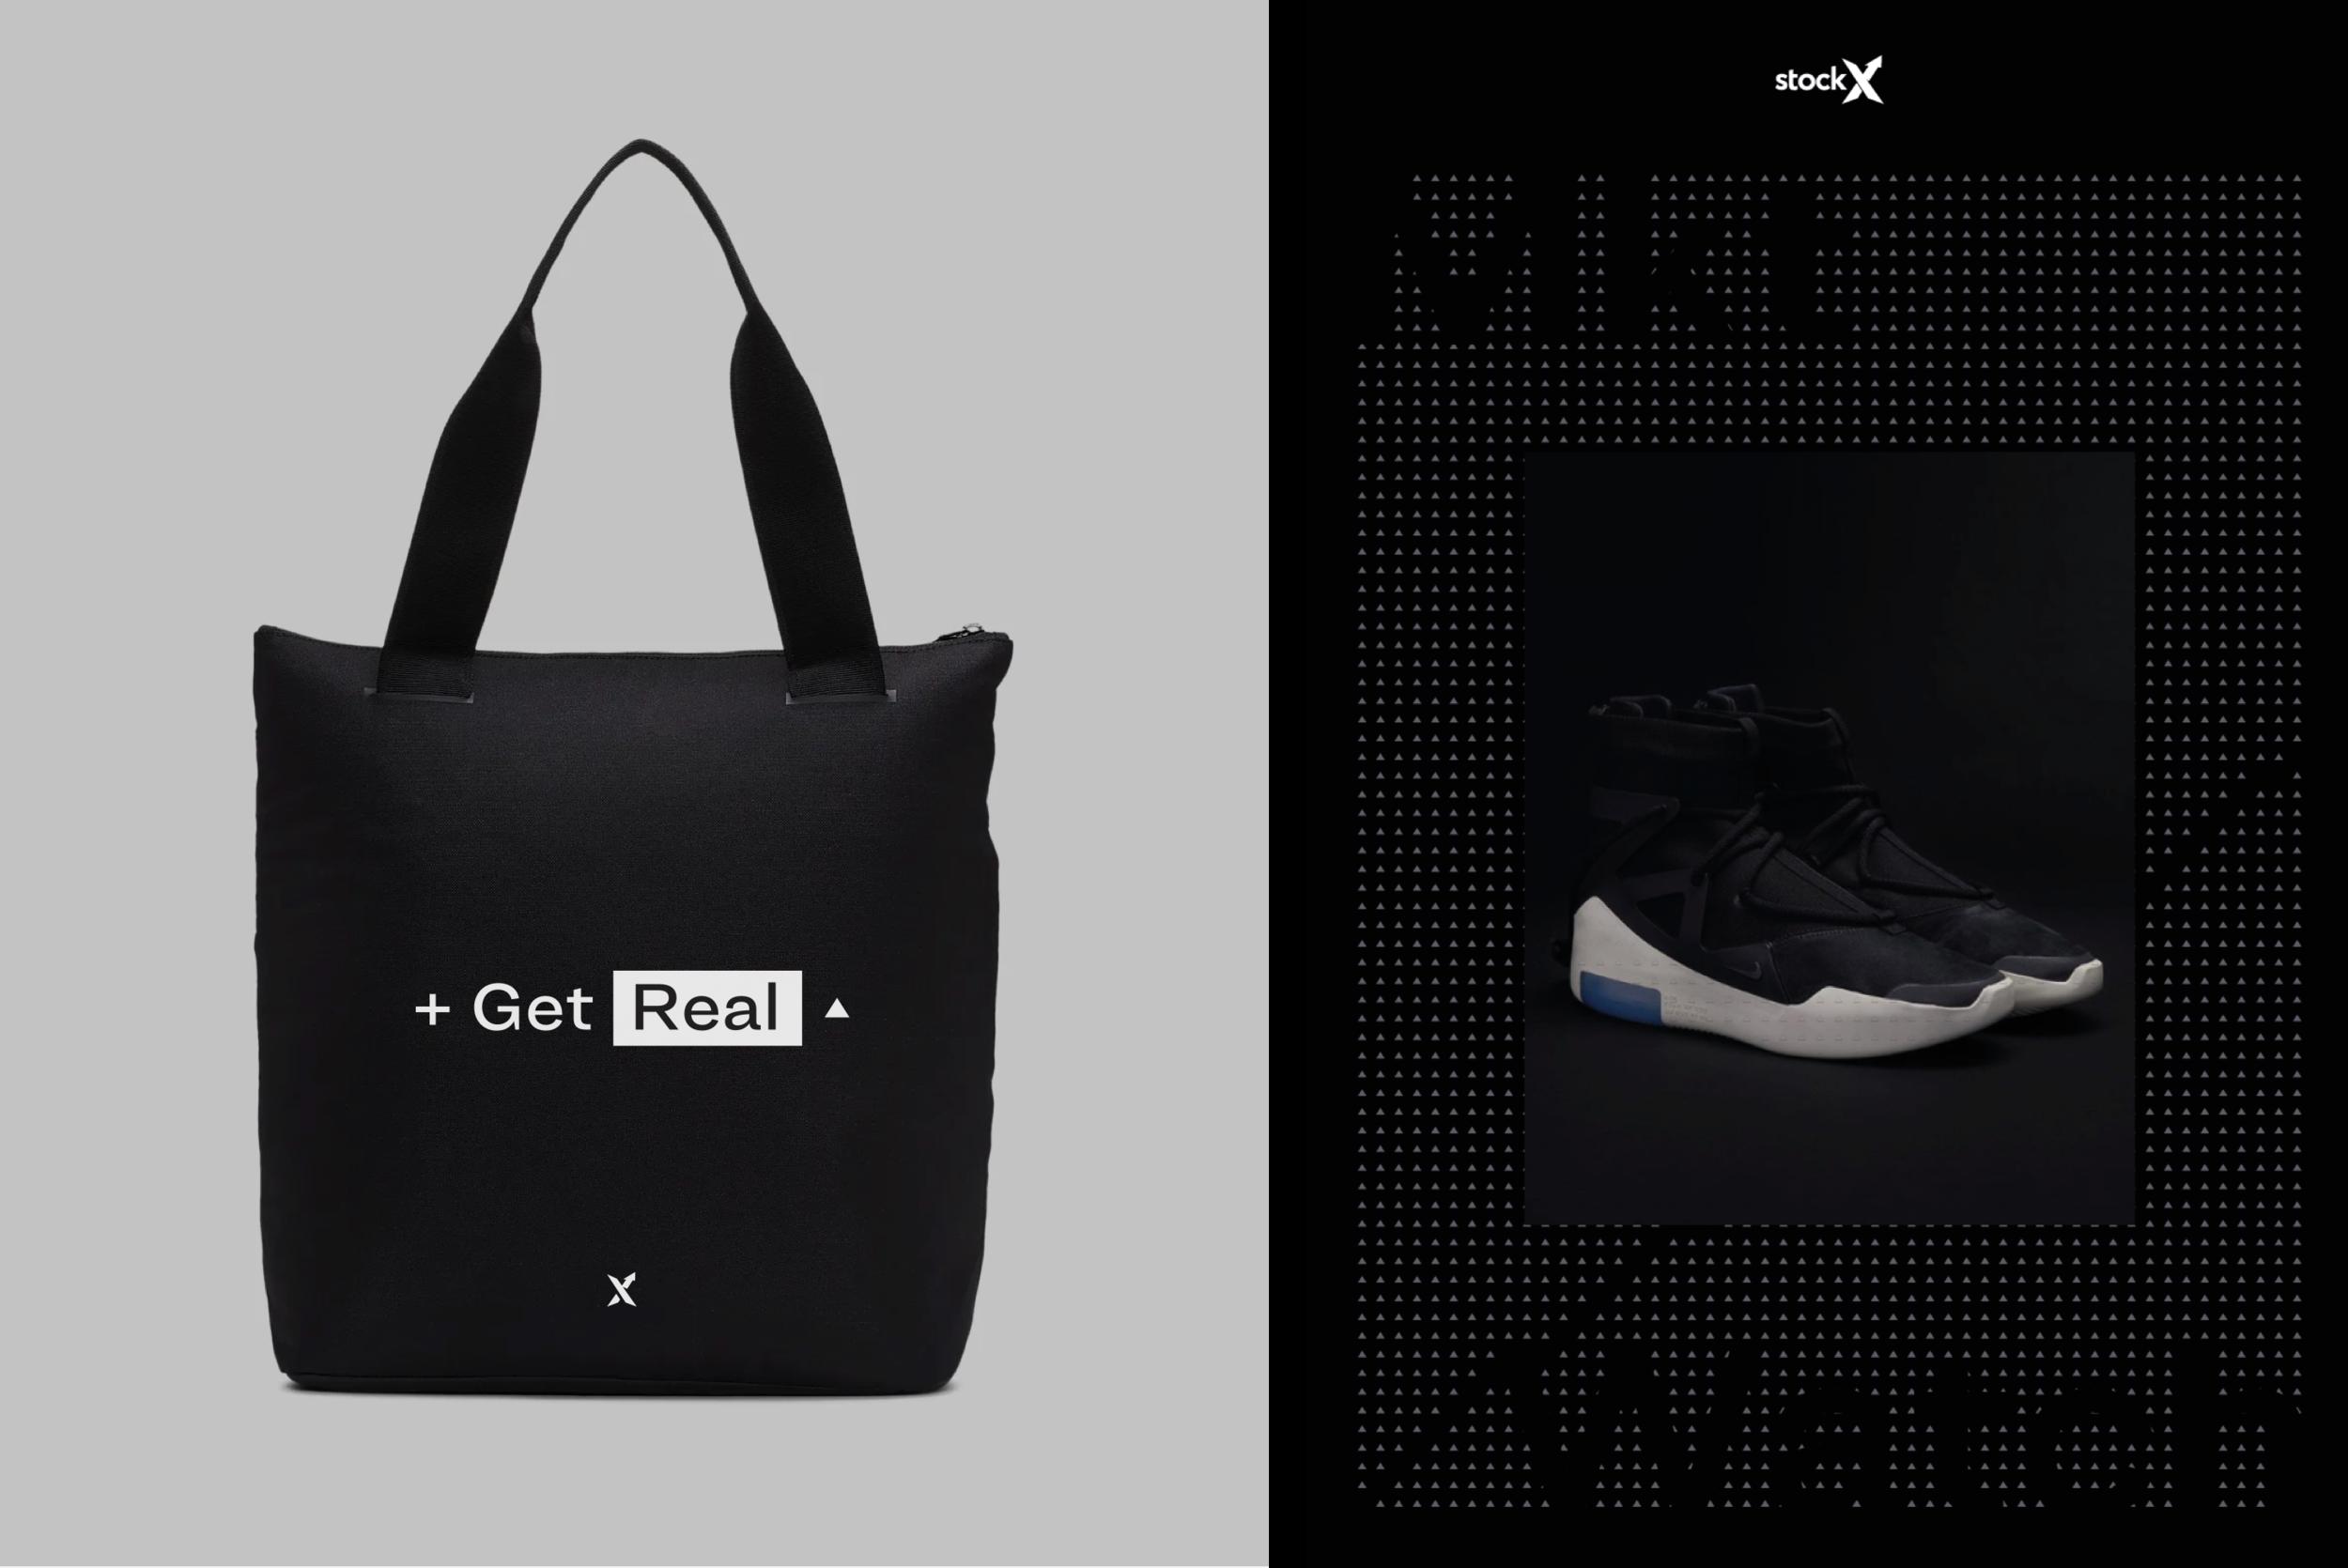 stockx-fashion-branding-9.png